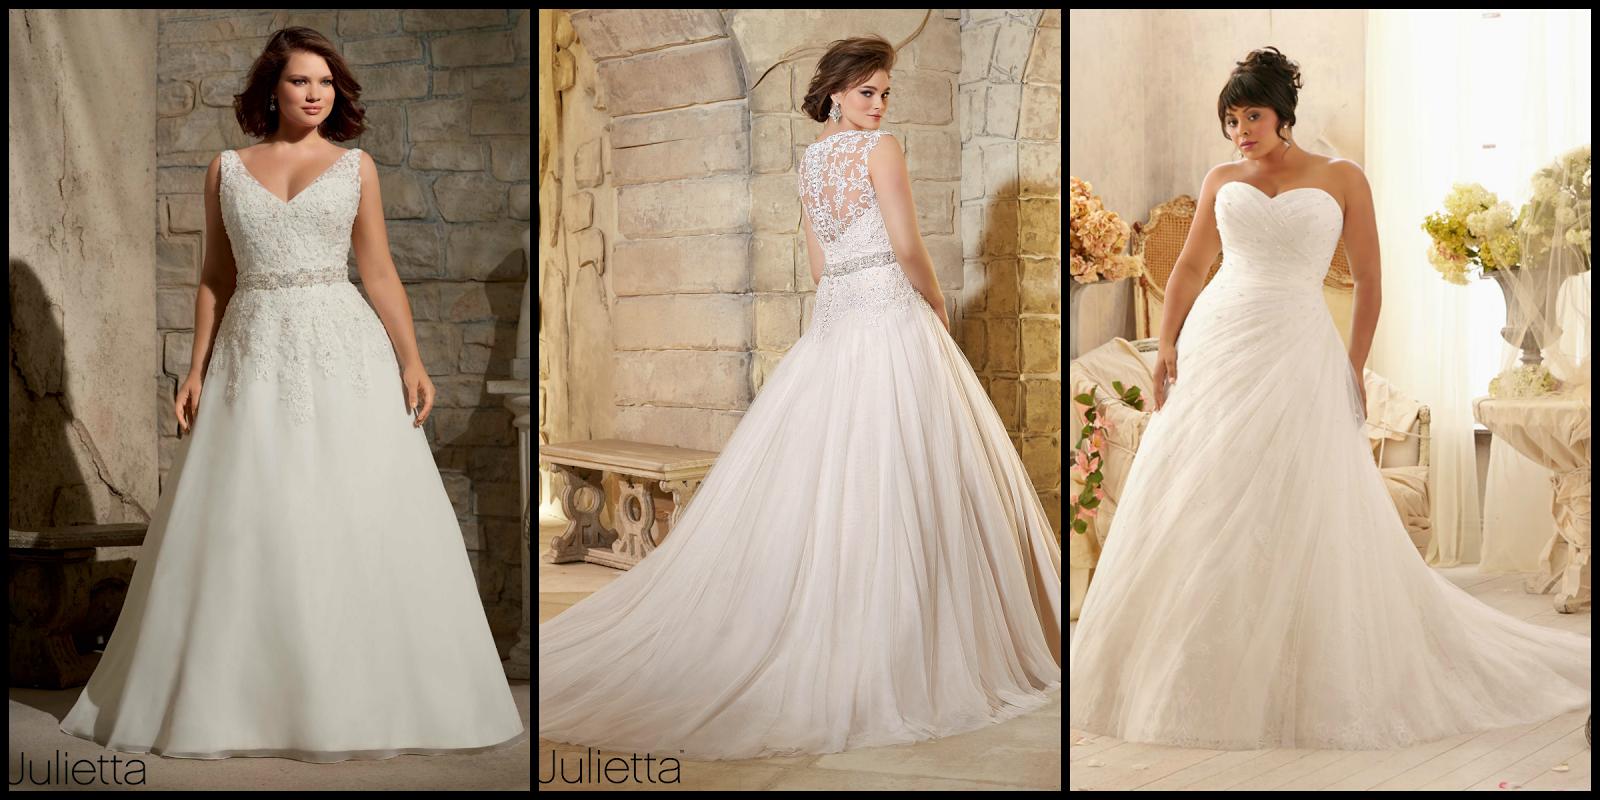 Brides Of America Online Store: Mori Lee's Julietta